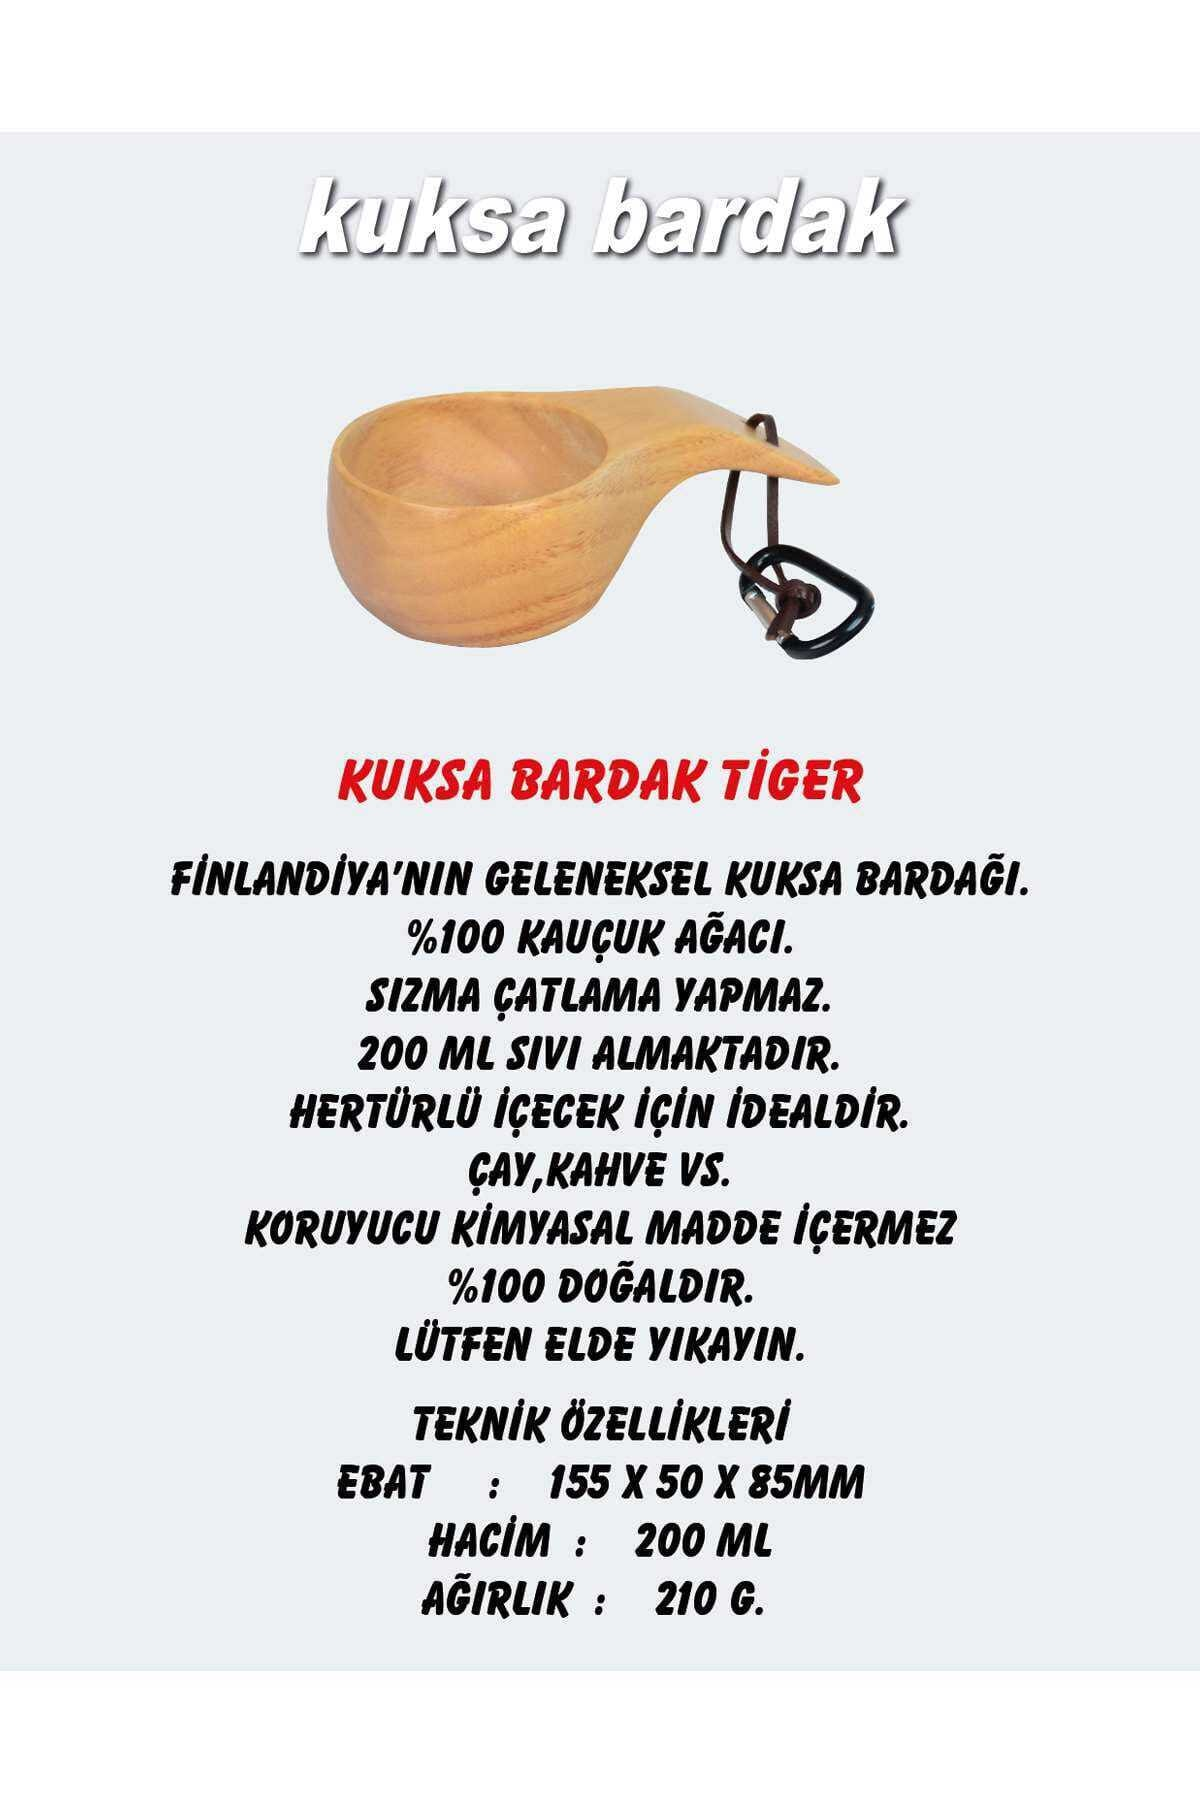 NURGAZ Ahşap Kuksa Bardak Tiger Ng Kks-t 2